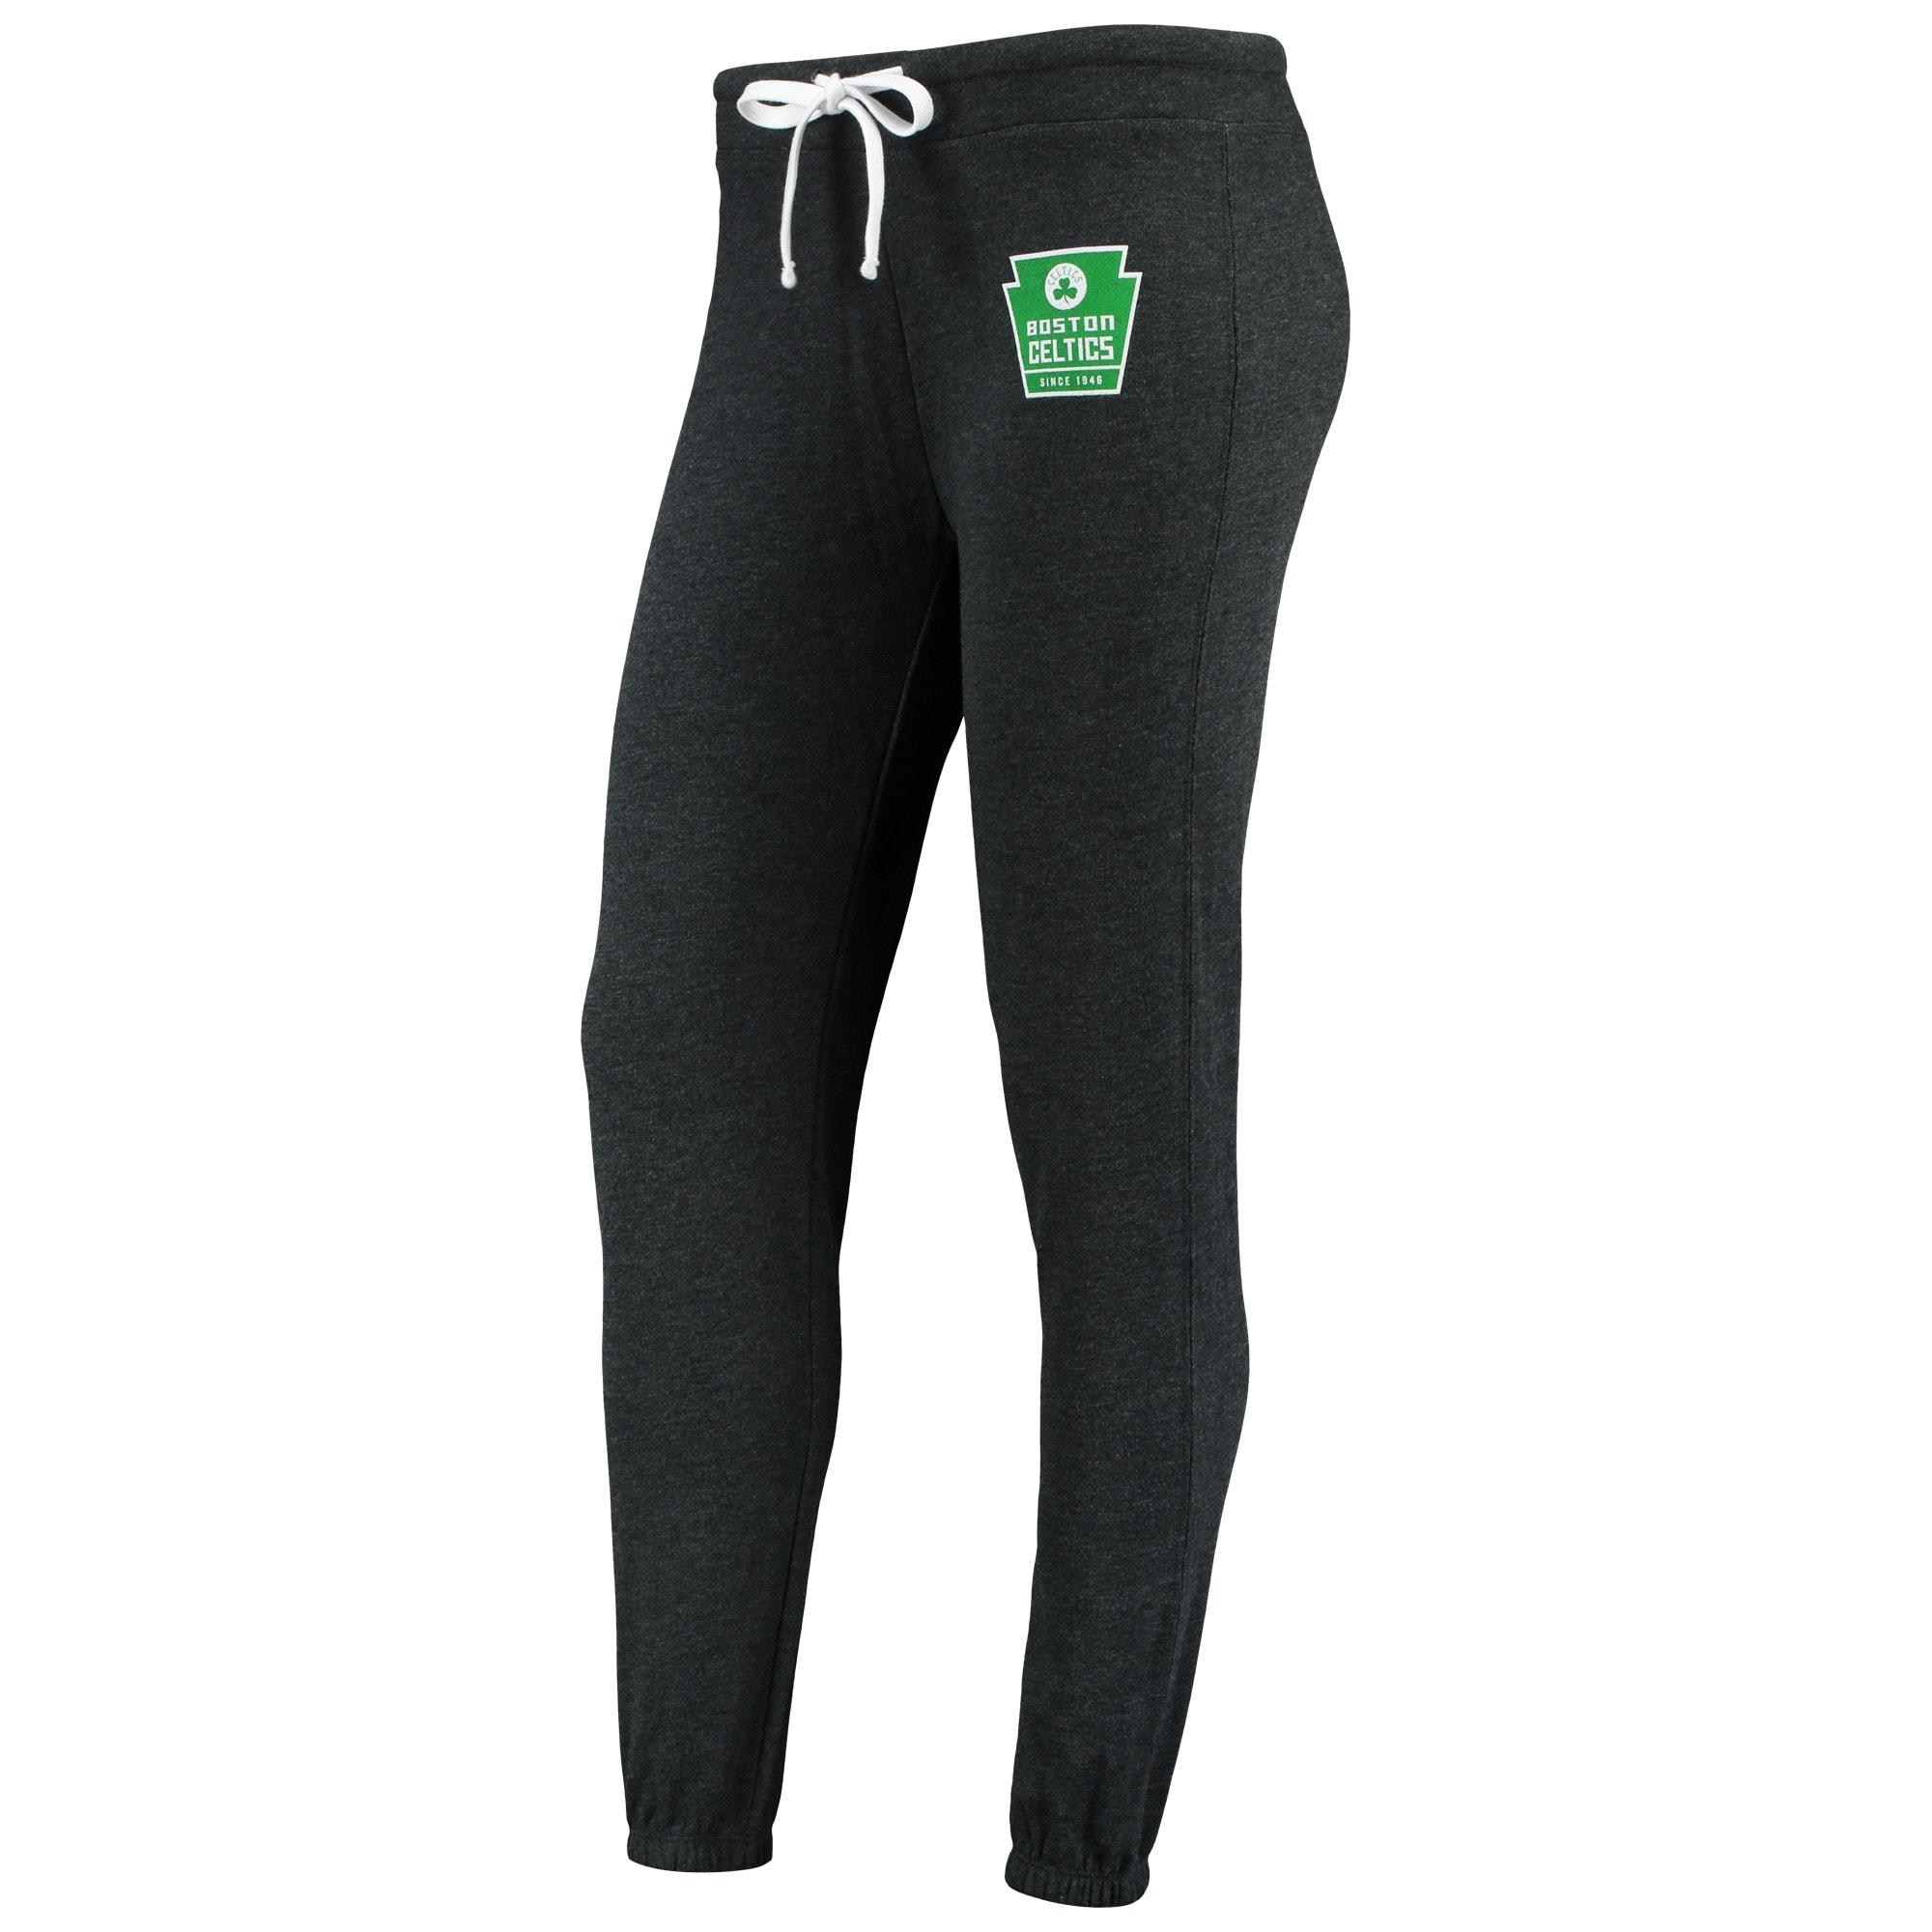 Boston Celtics Sportiqe Women's Dundee Classic Sweatpants - Black